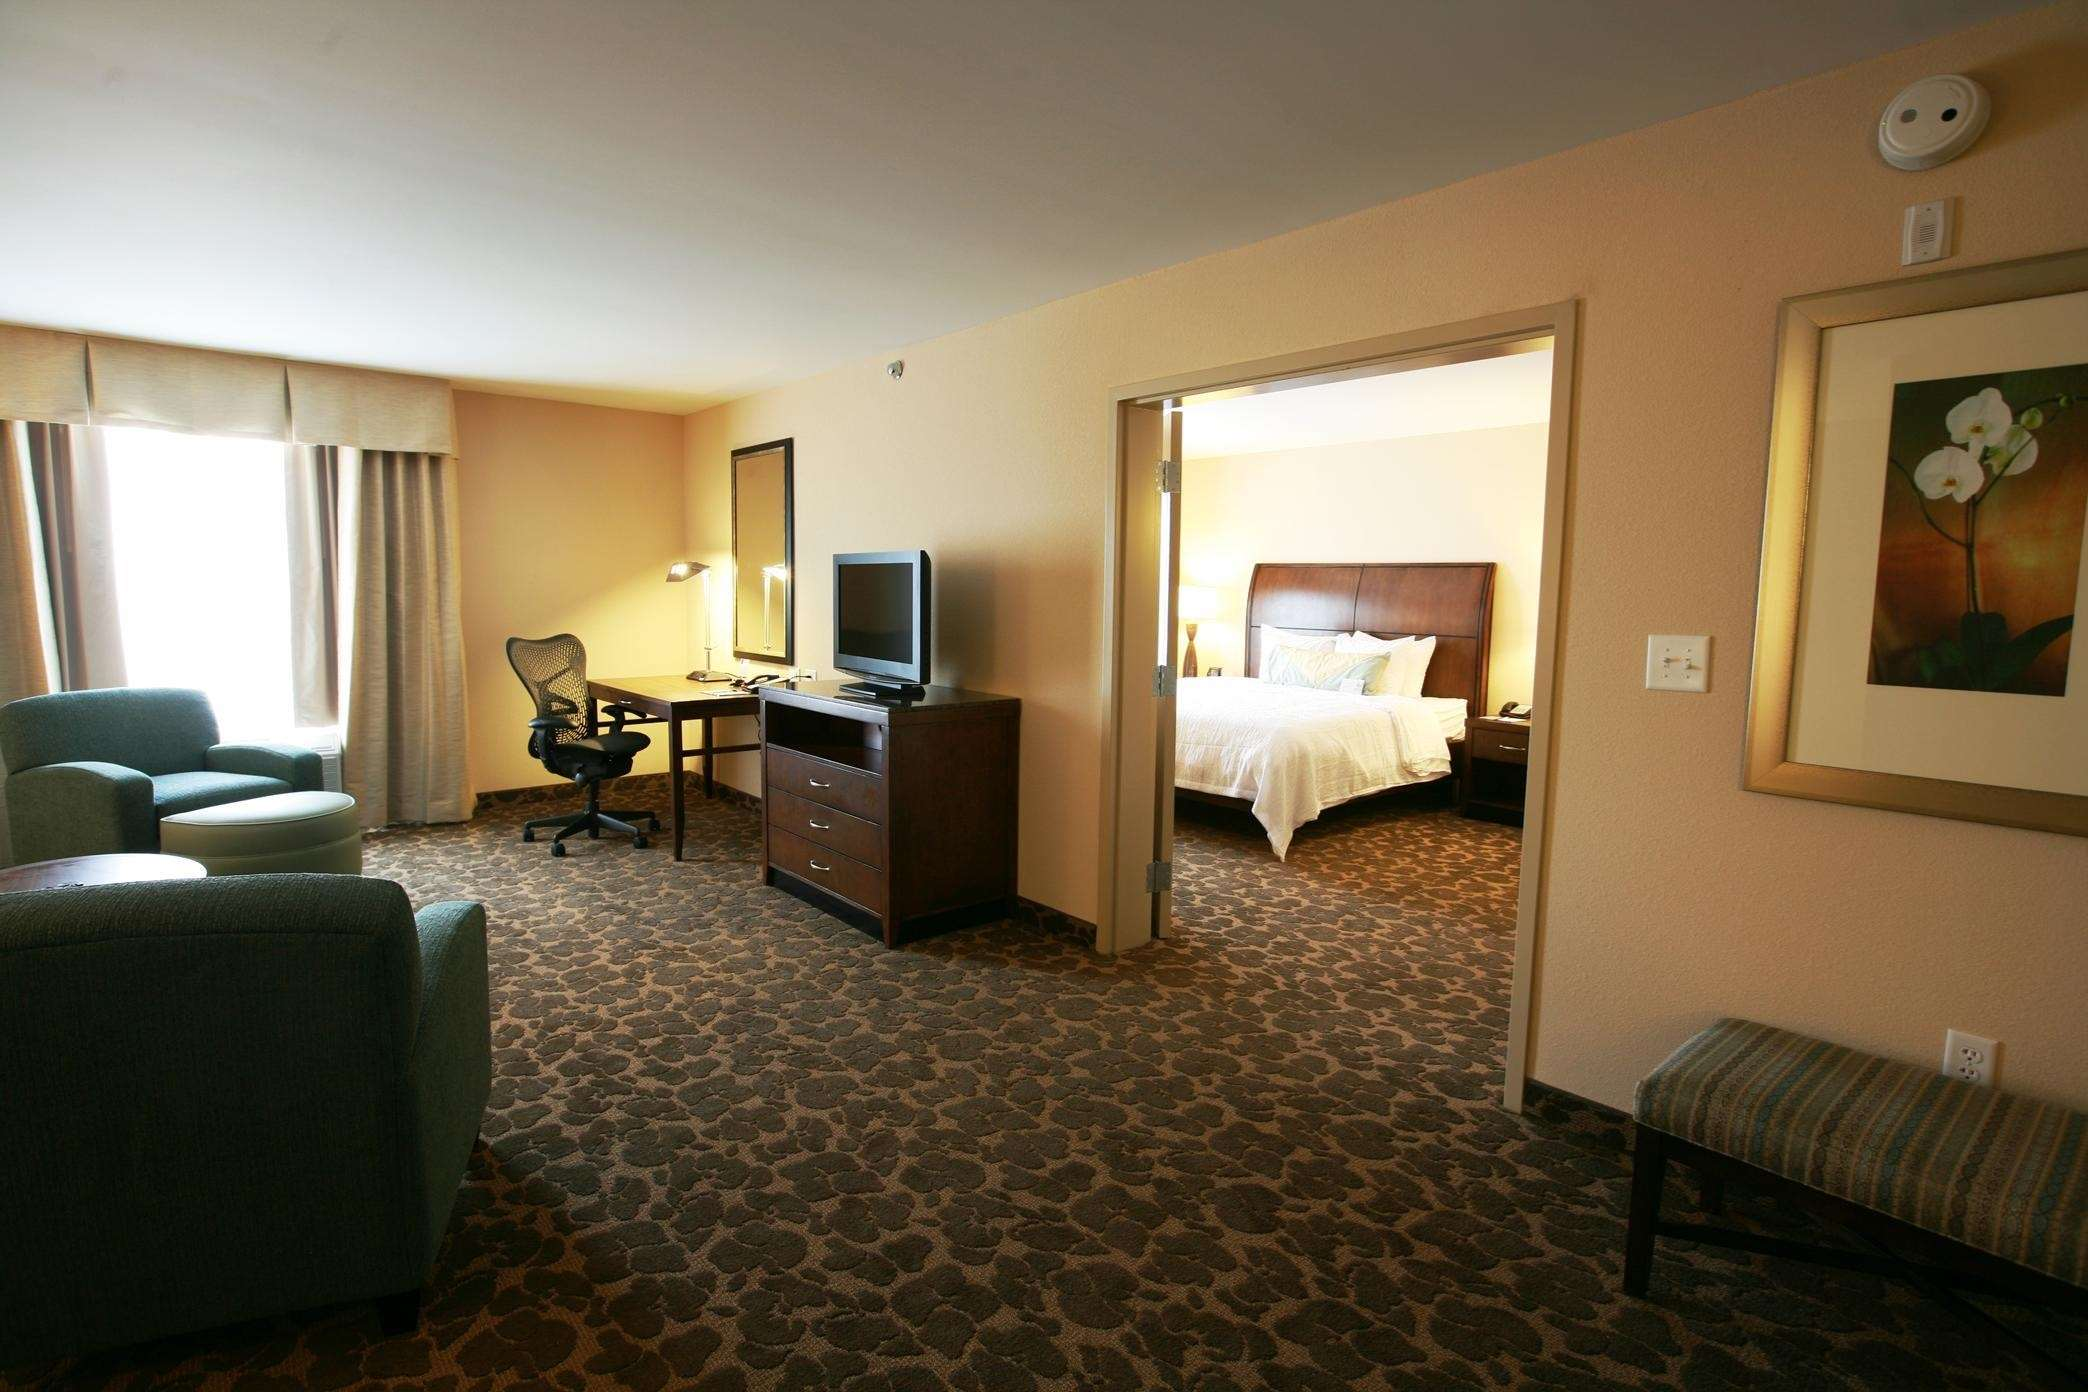 Hilton Garden Inn Charlotte/Concord image 13